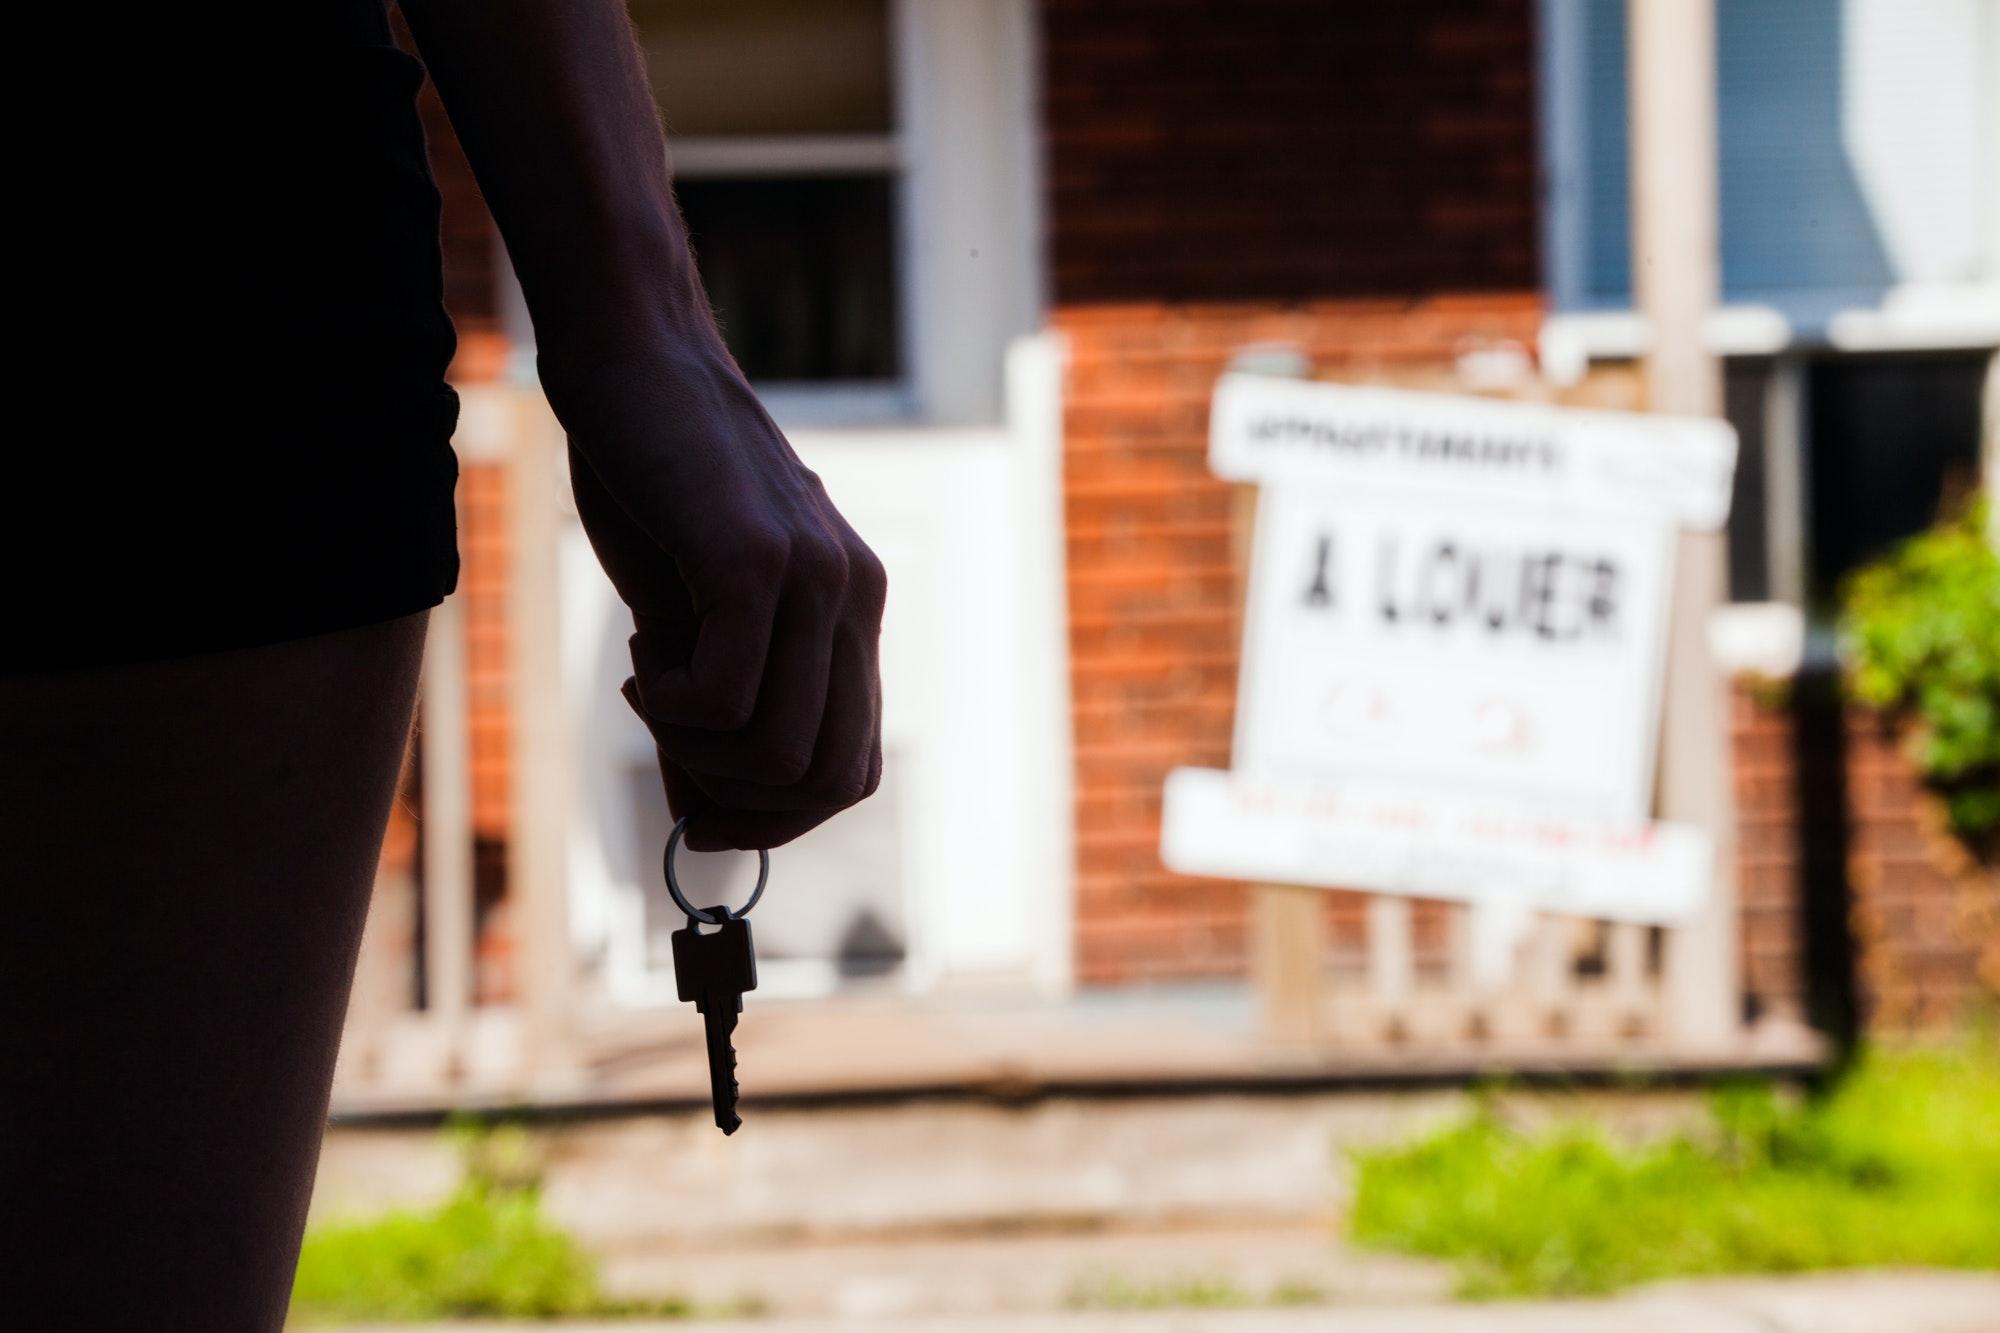 particuliers-avocat-droit-immobilier-location-agn-avocats.fr